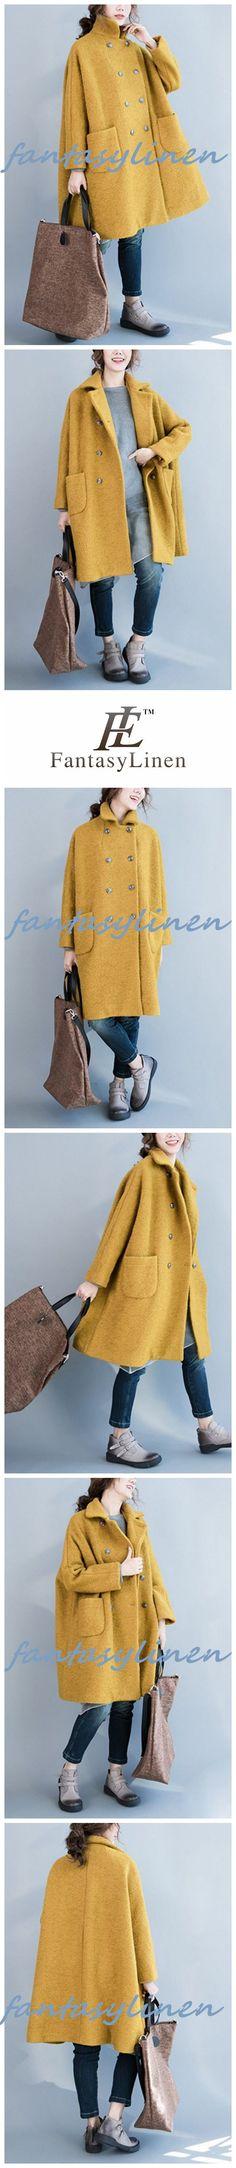 Wool Peacoat Womens Wool Coats W1401 W1401